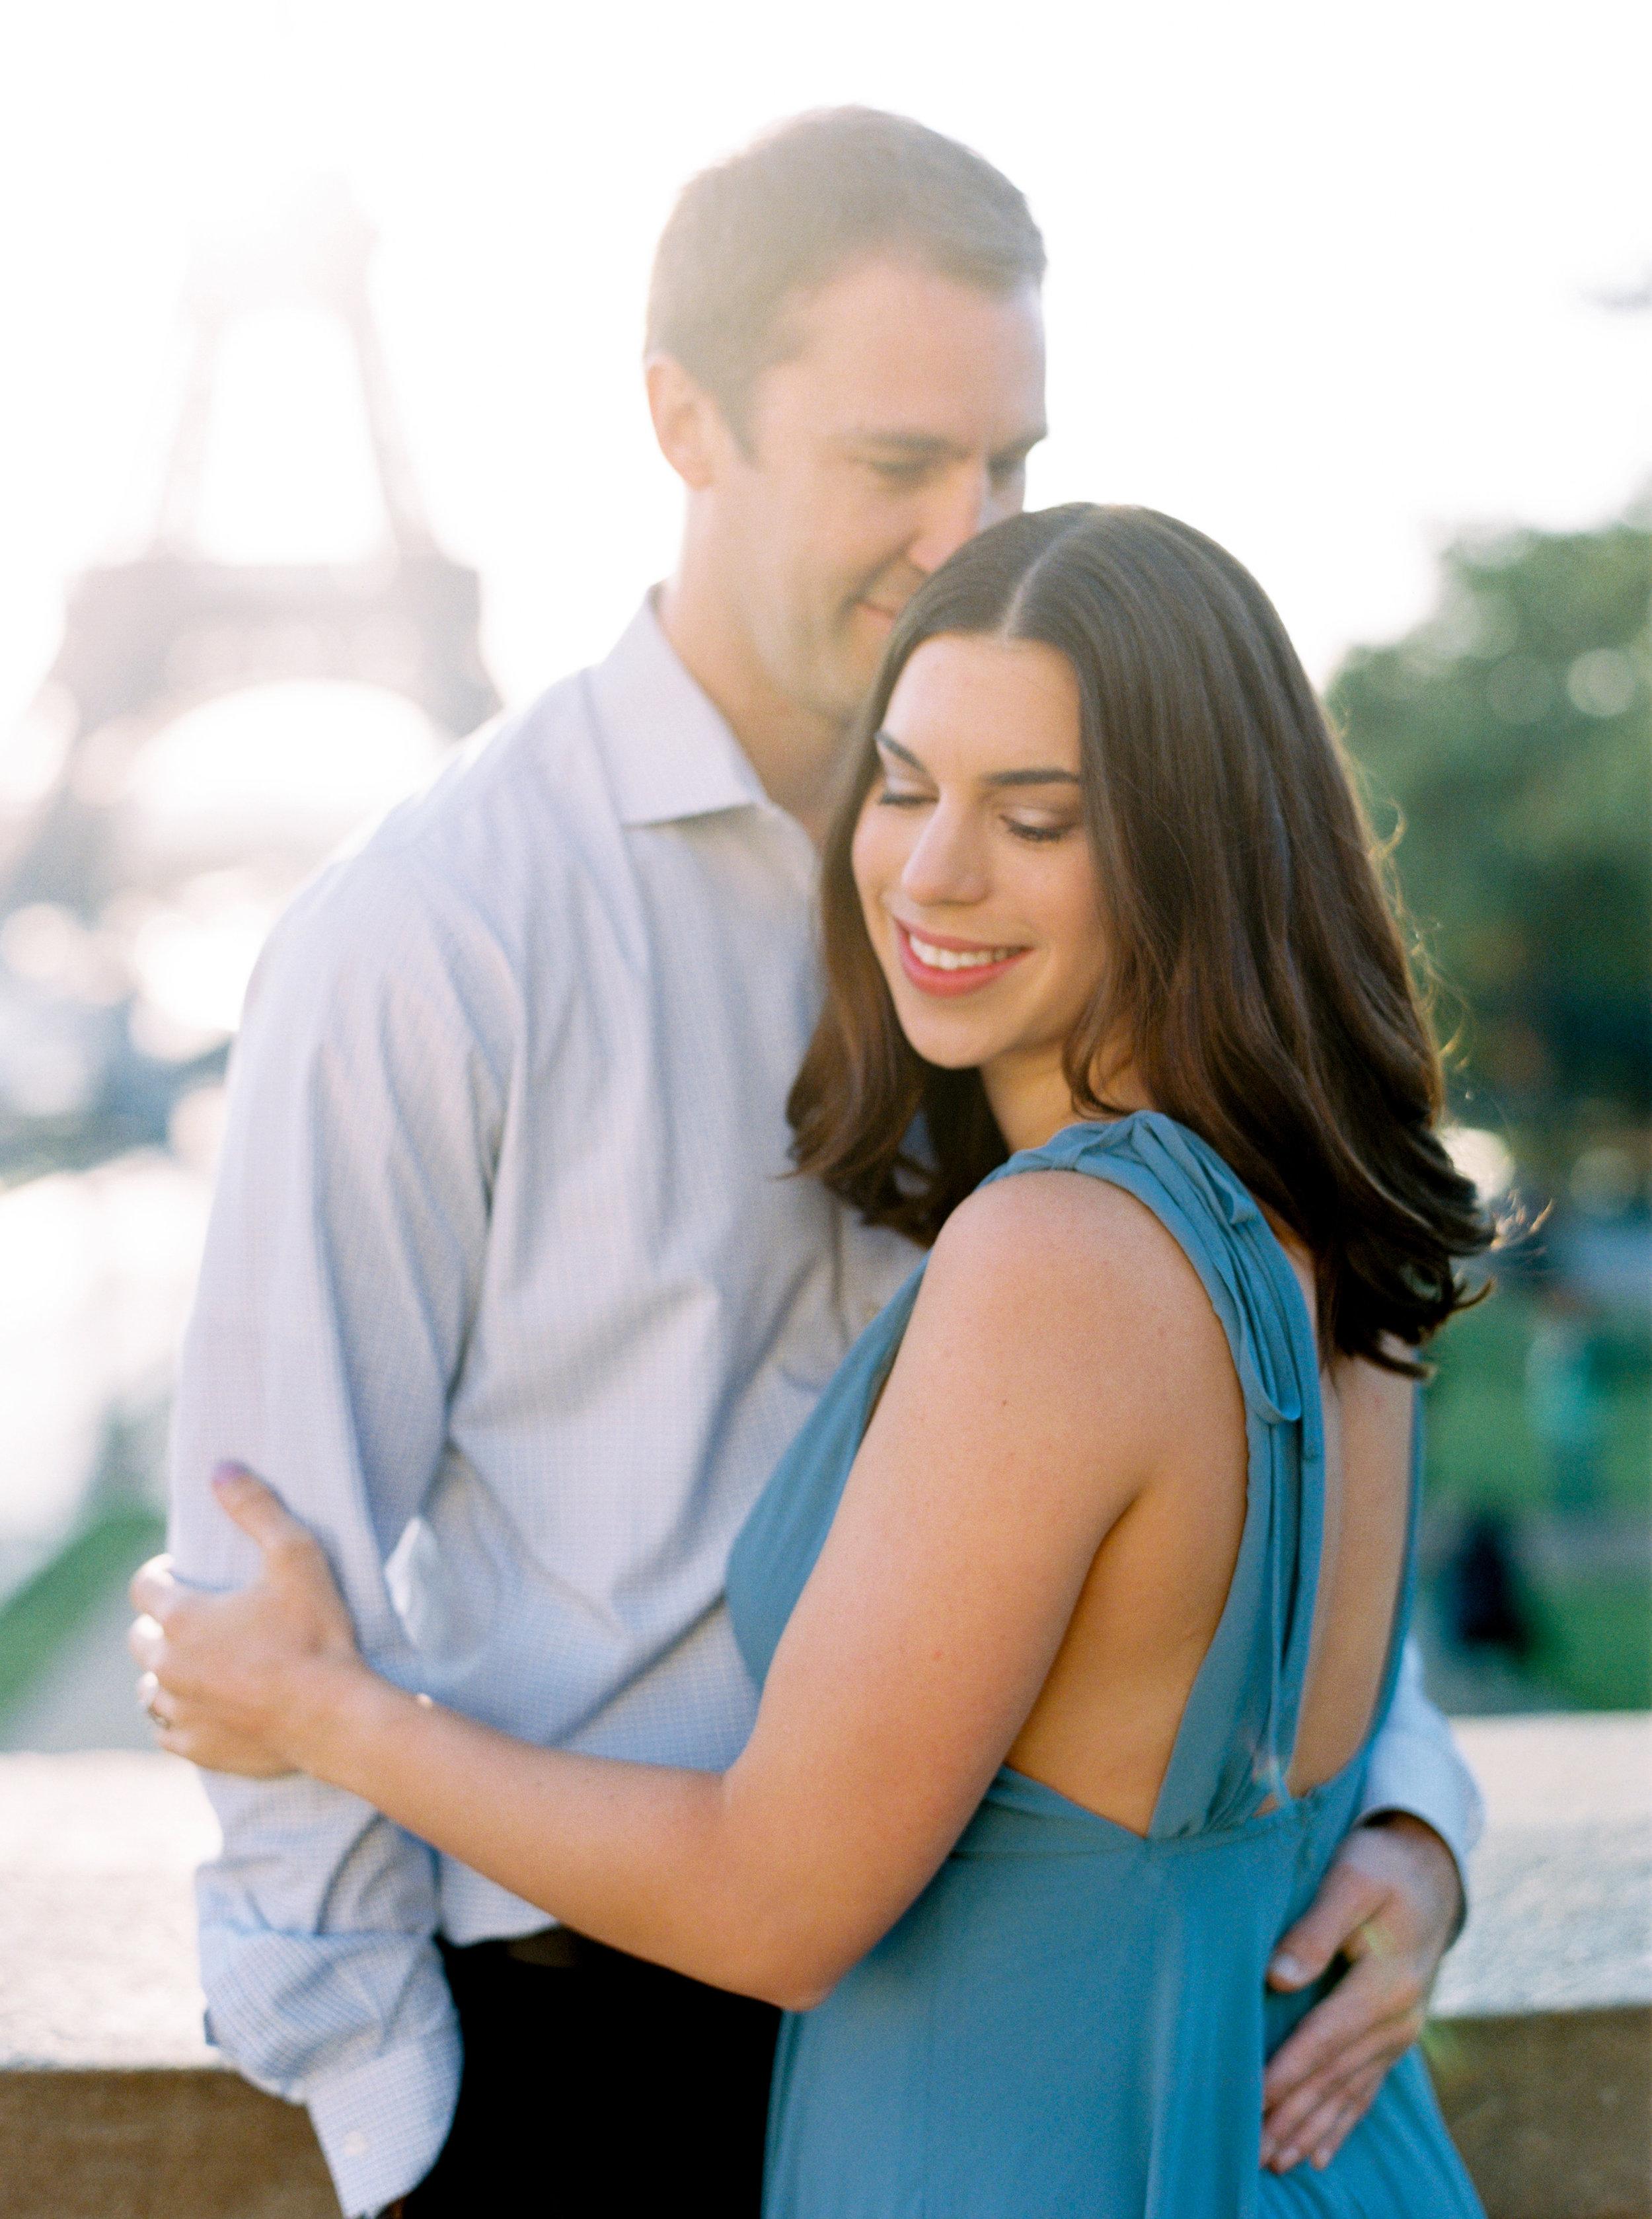 paris-france-wedding-photographer-destination-photographer-57.jpg